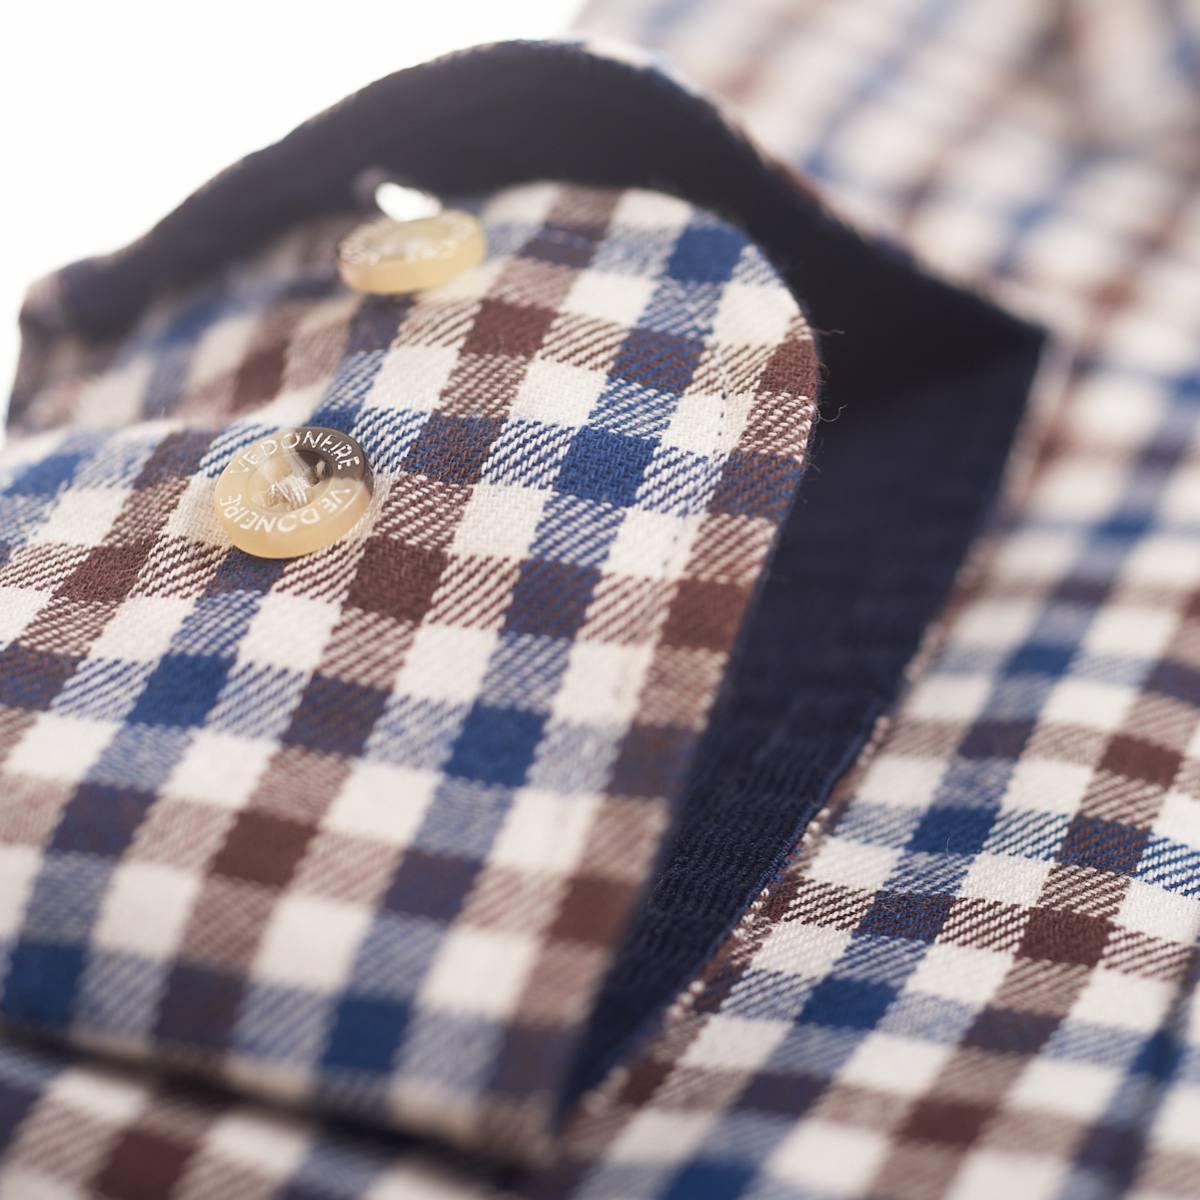 Vedoneire Shirt Brushed Cotton Plaid Navy Brown | Restoration Yard